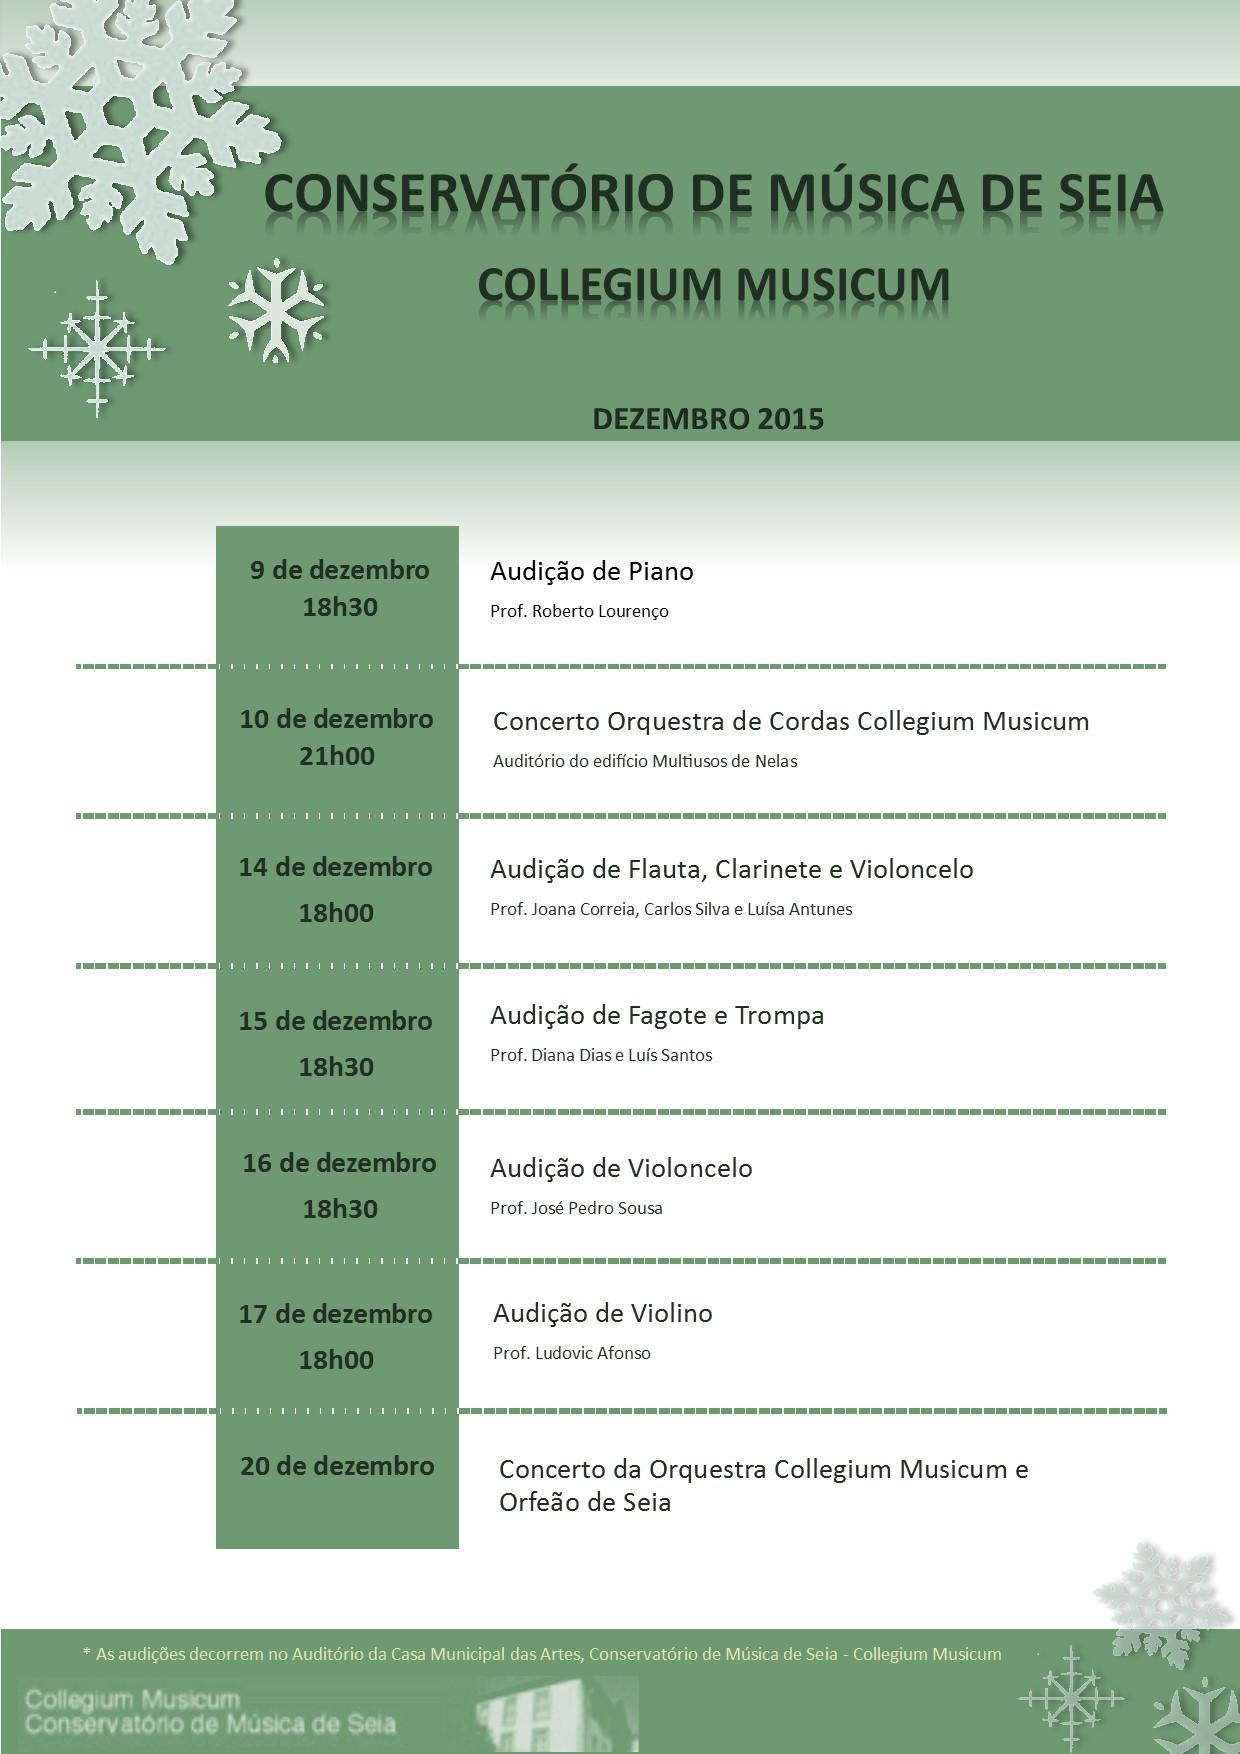 Agenda de Dezembro 2015